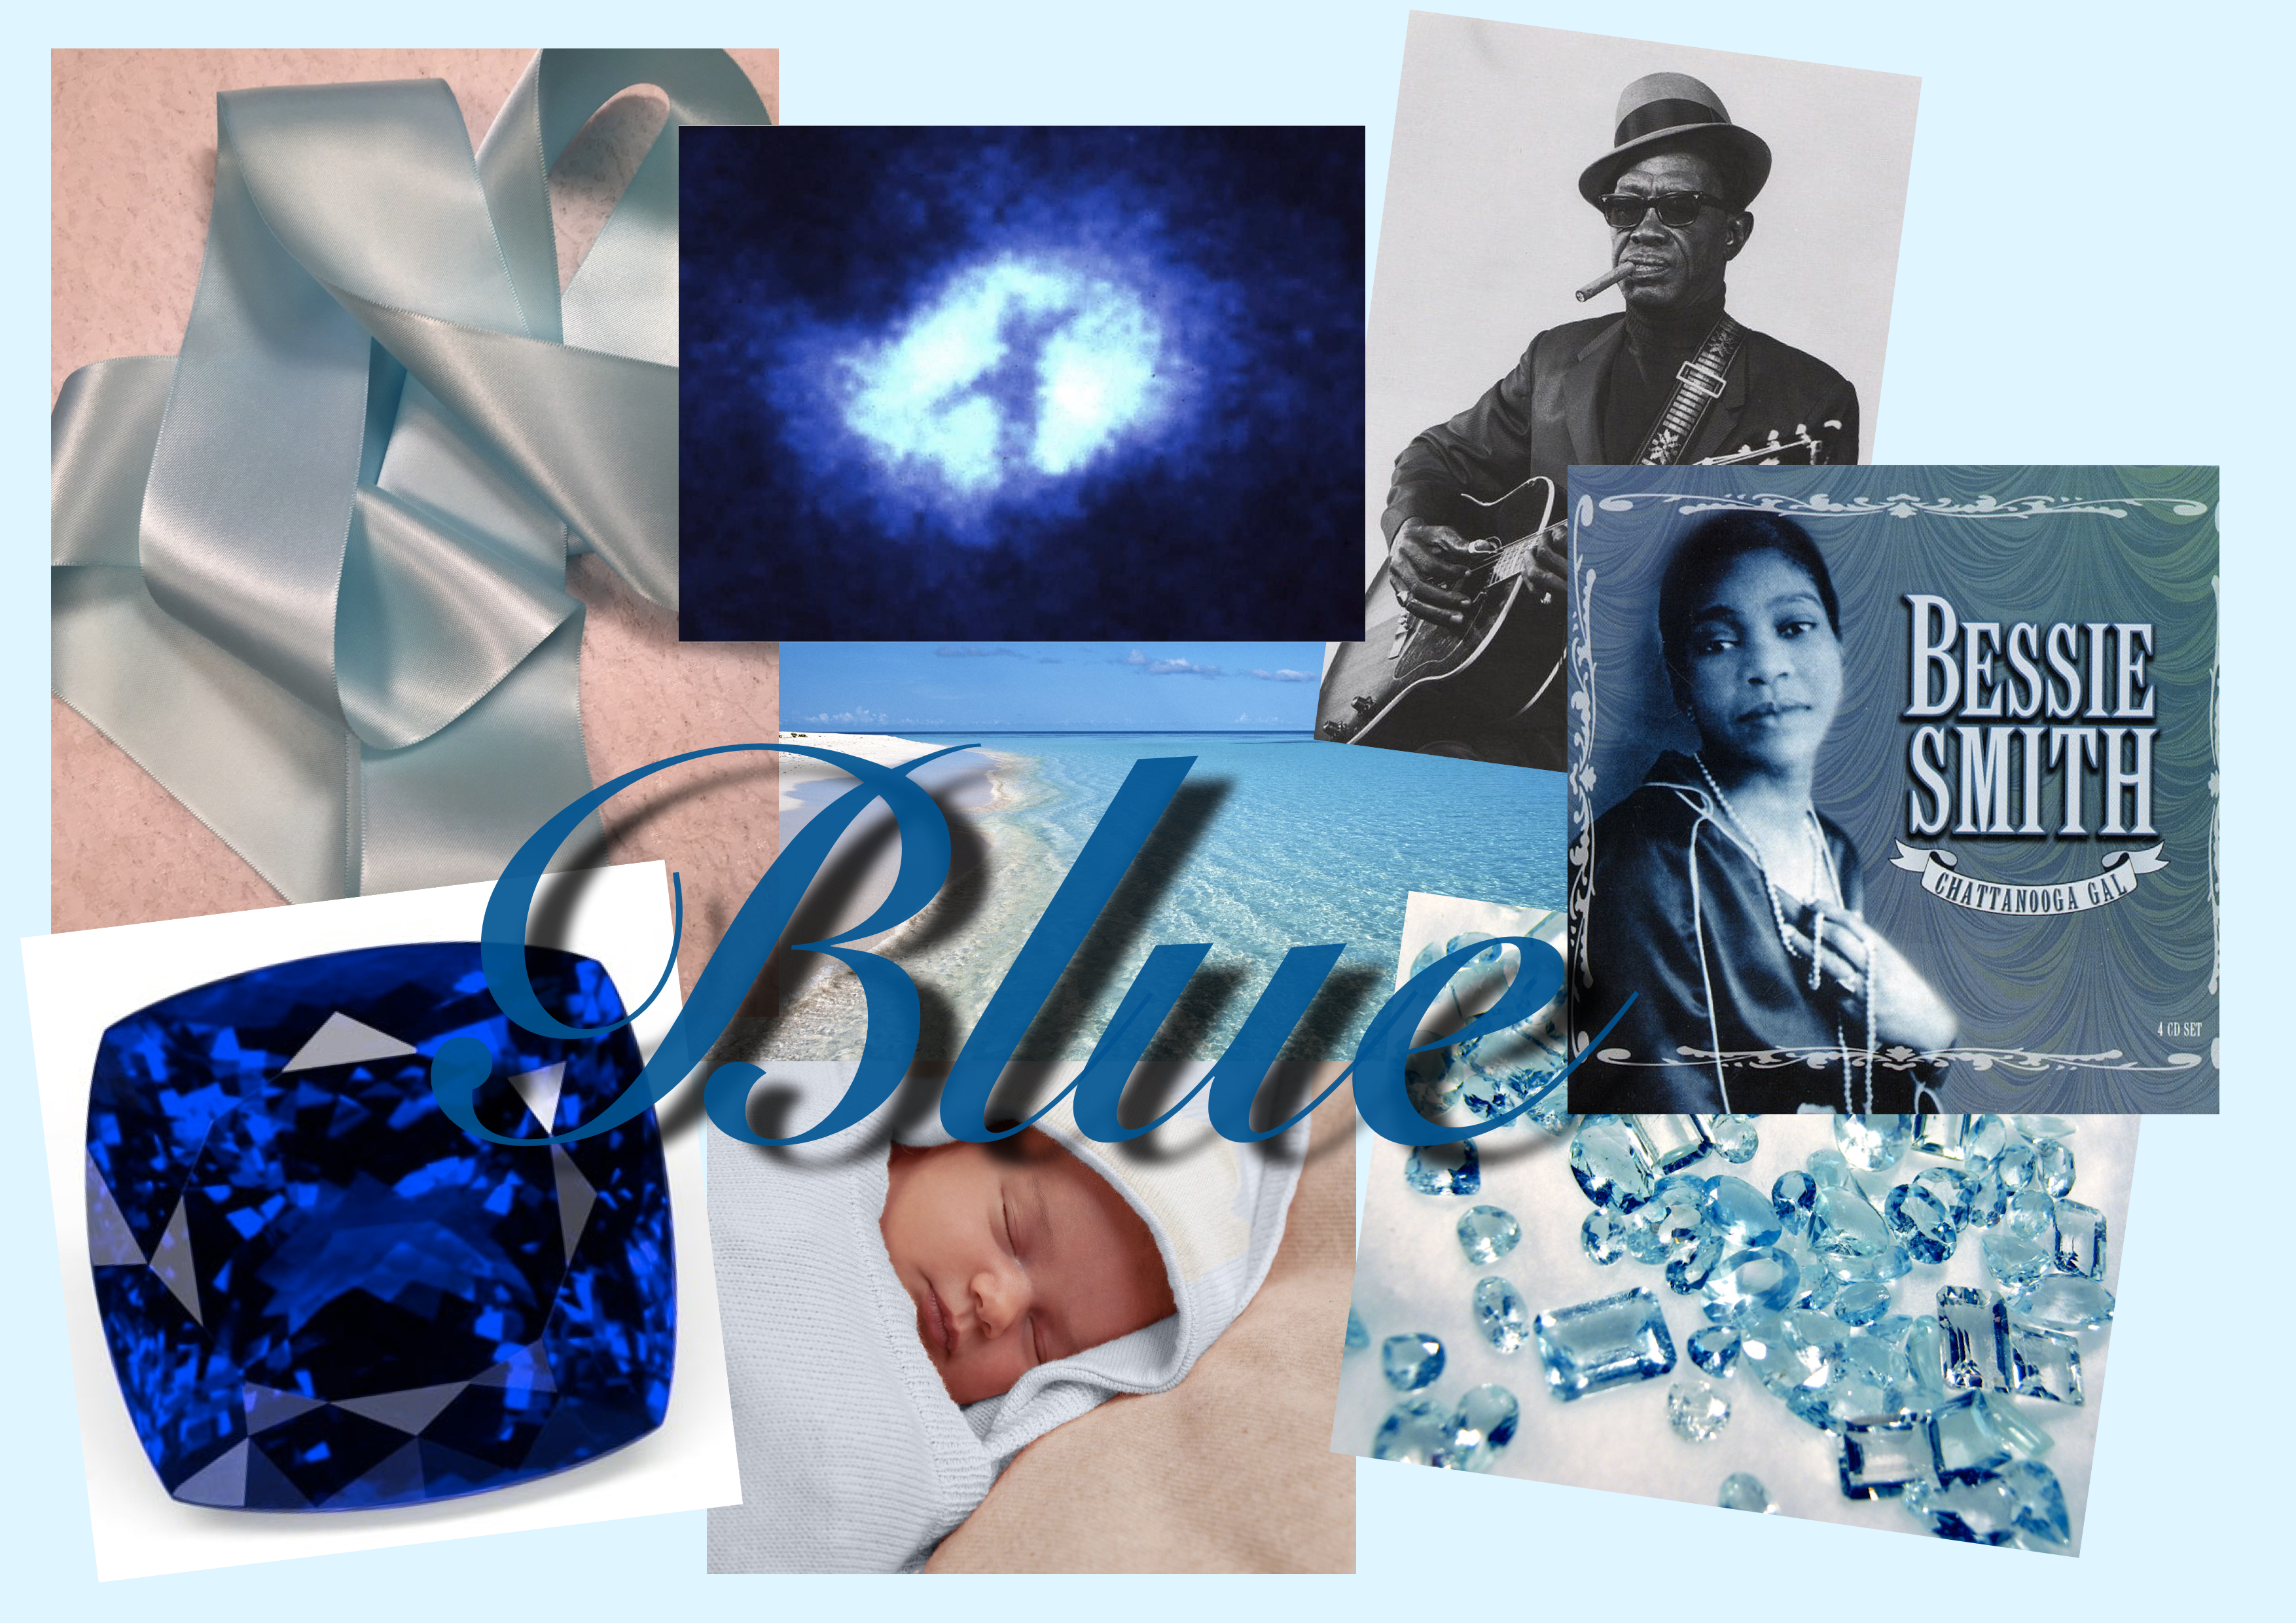 Blue - Image 3 jpg.